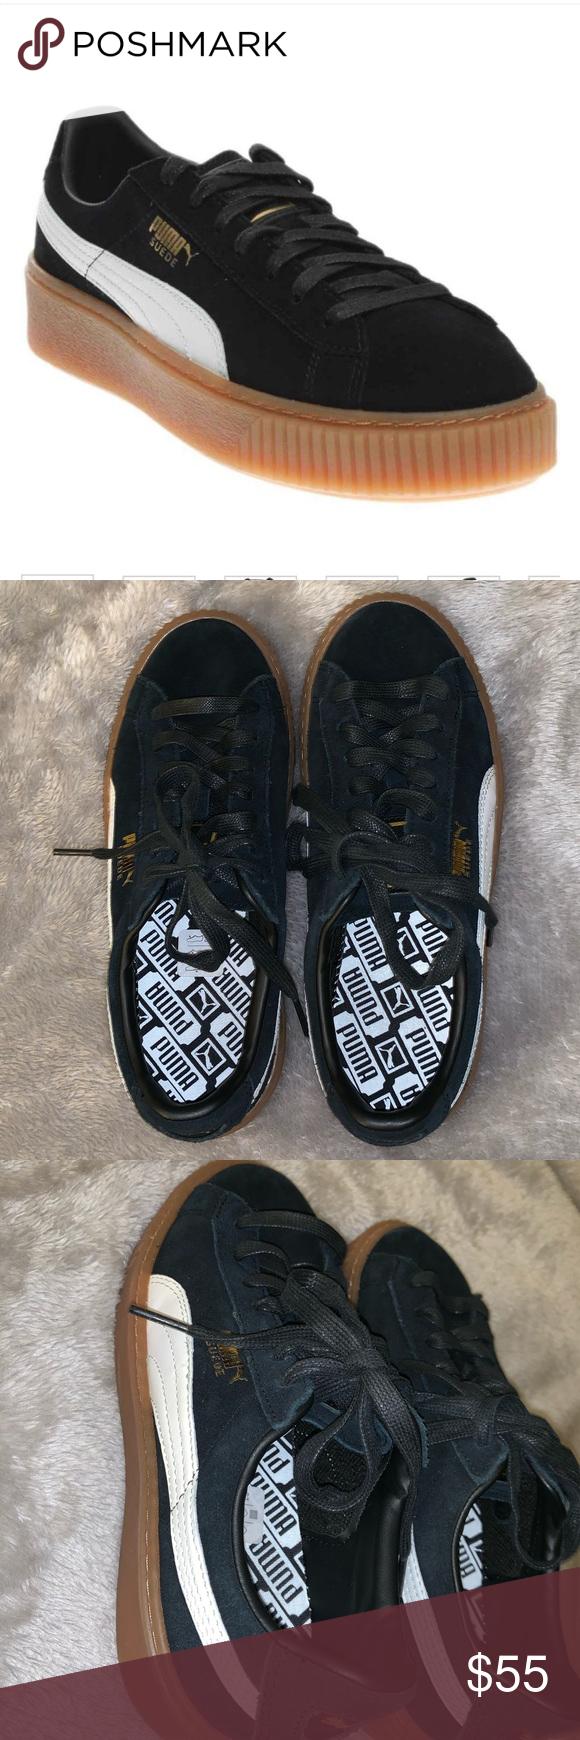 Puma basket case platform sneakers